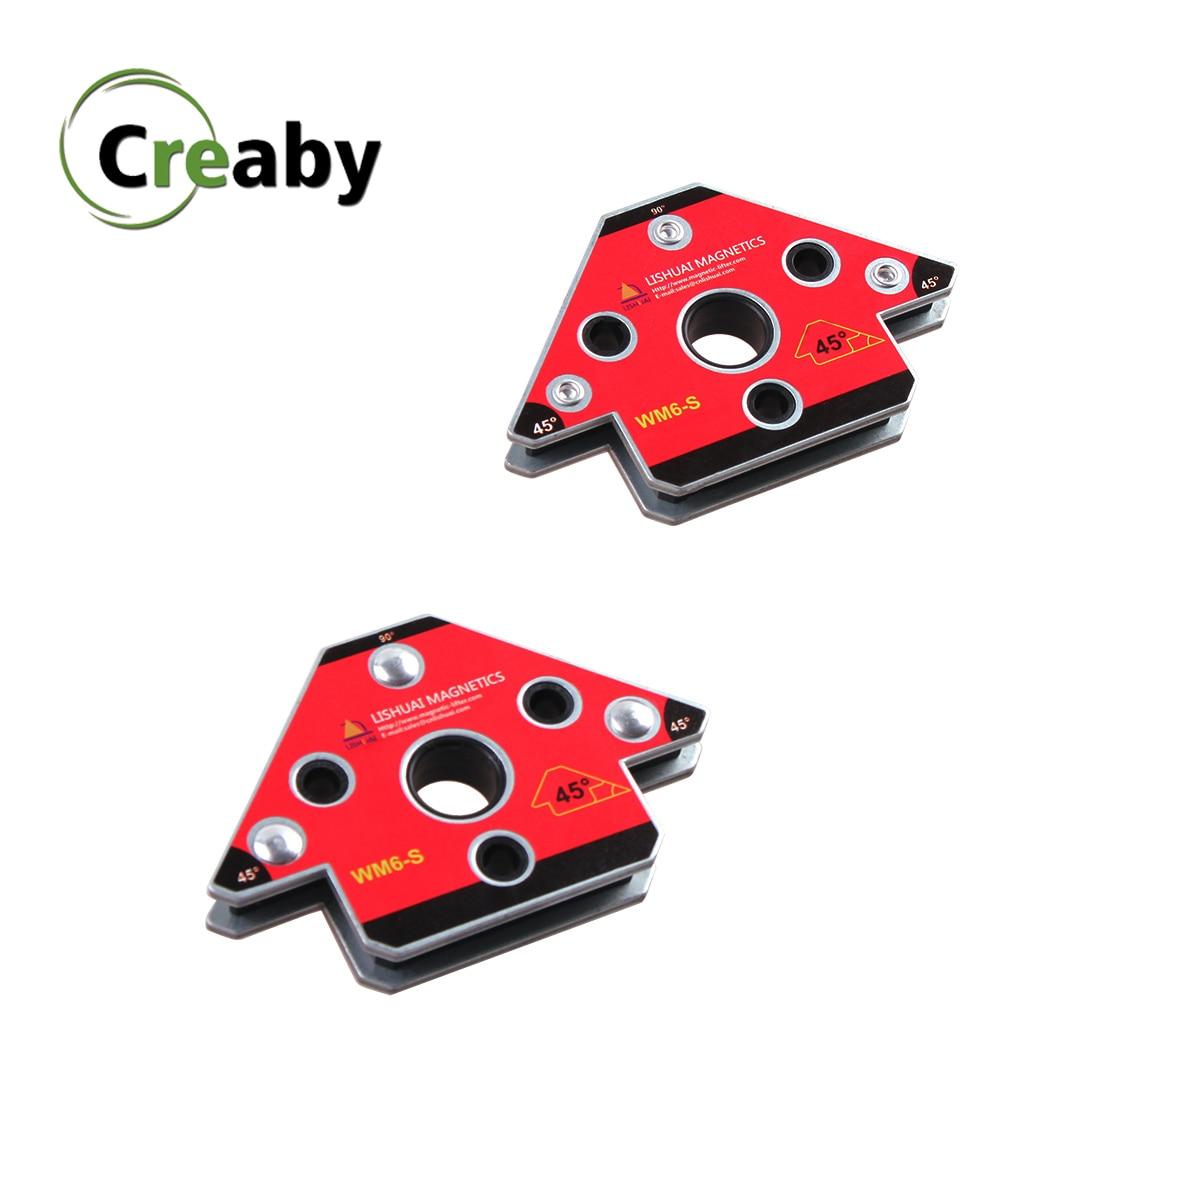 2pcs set Small  Arrow Welding Magnet Neodymium Magnetic Welding Holder Magnet Welding Clamp WM6-S